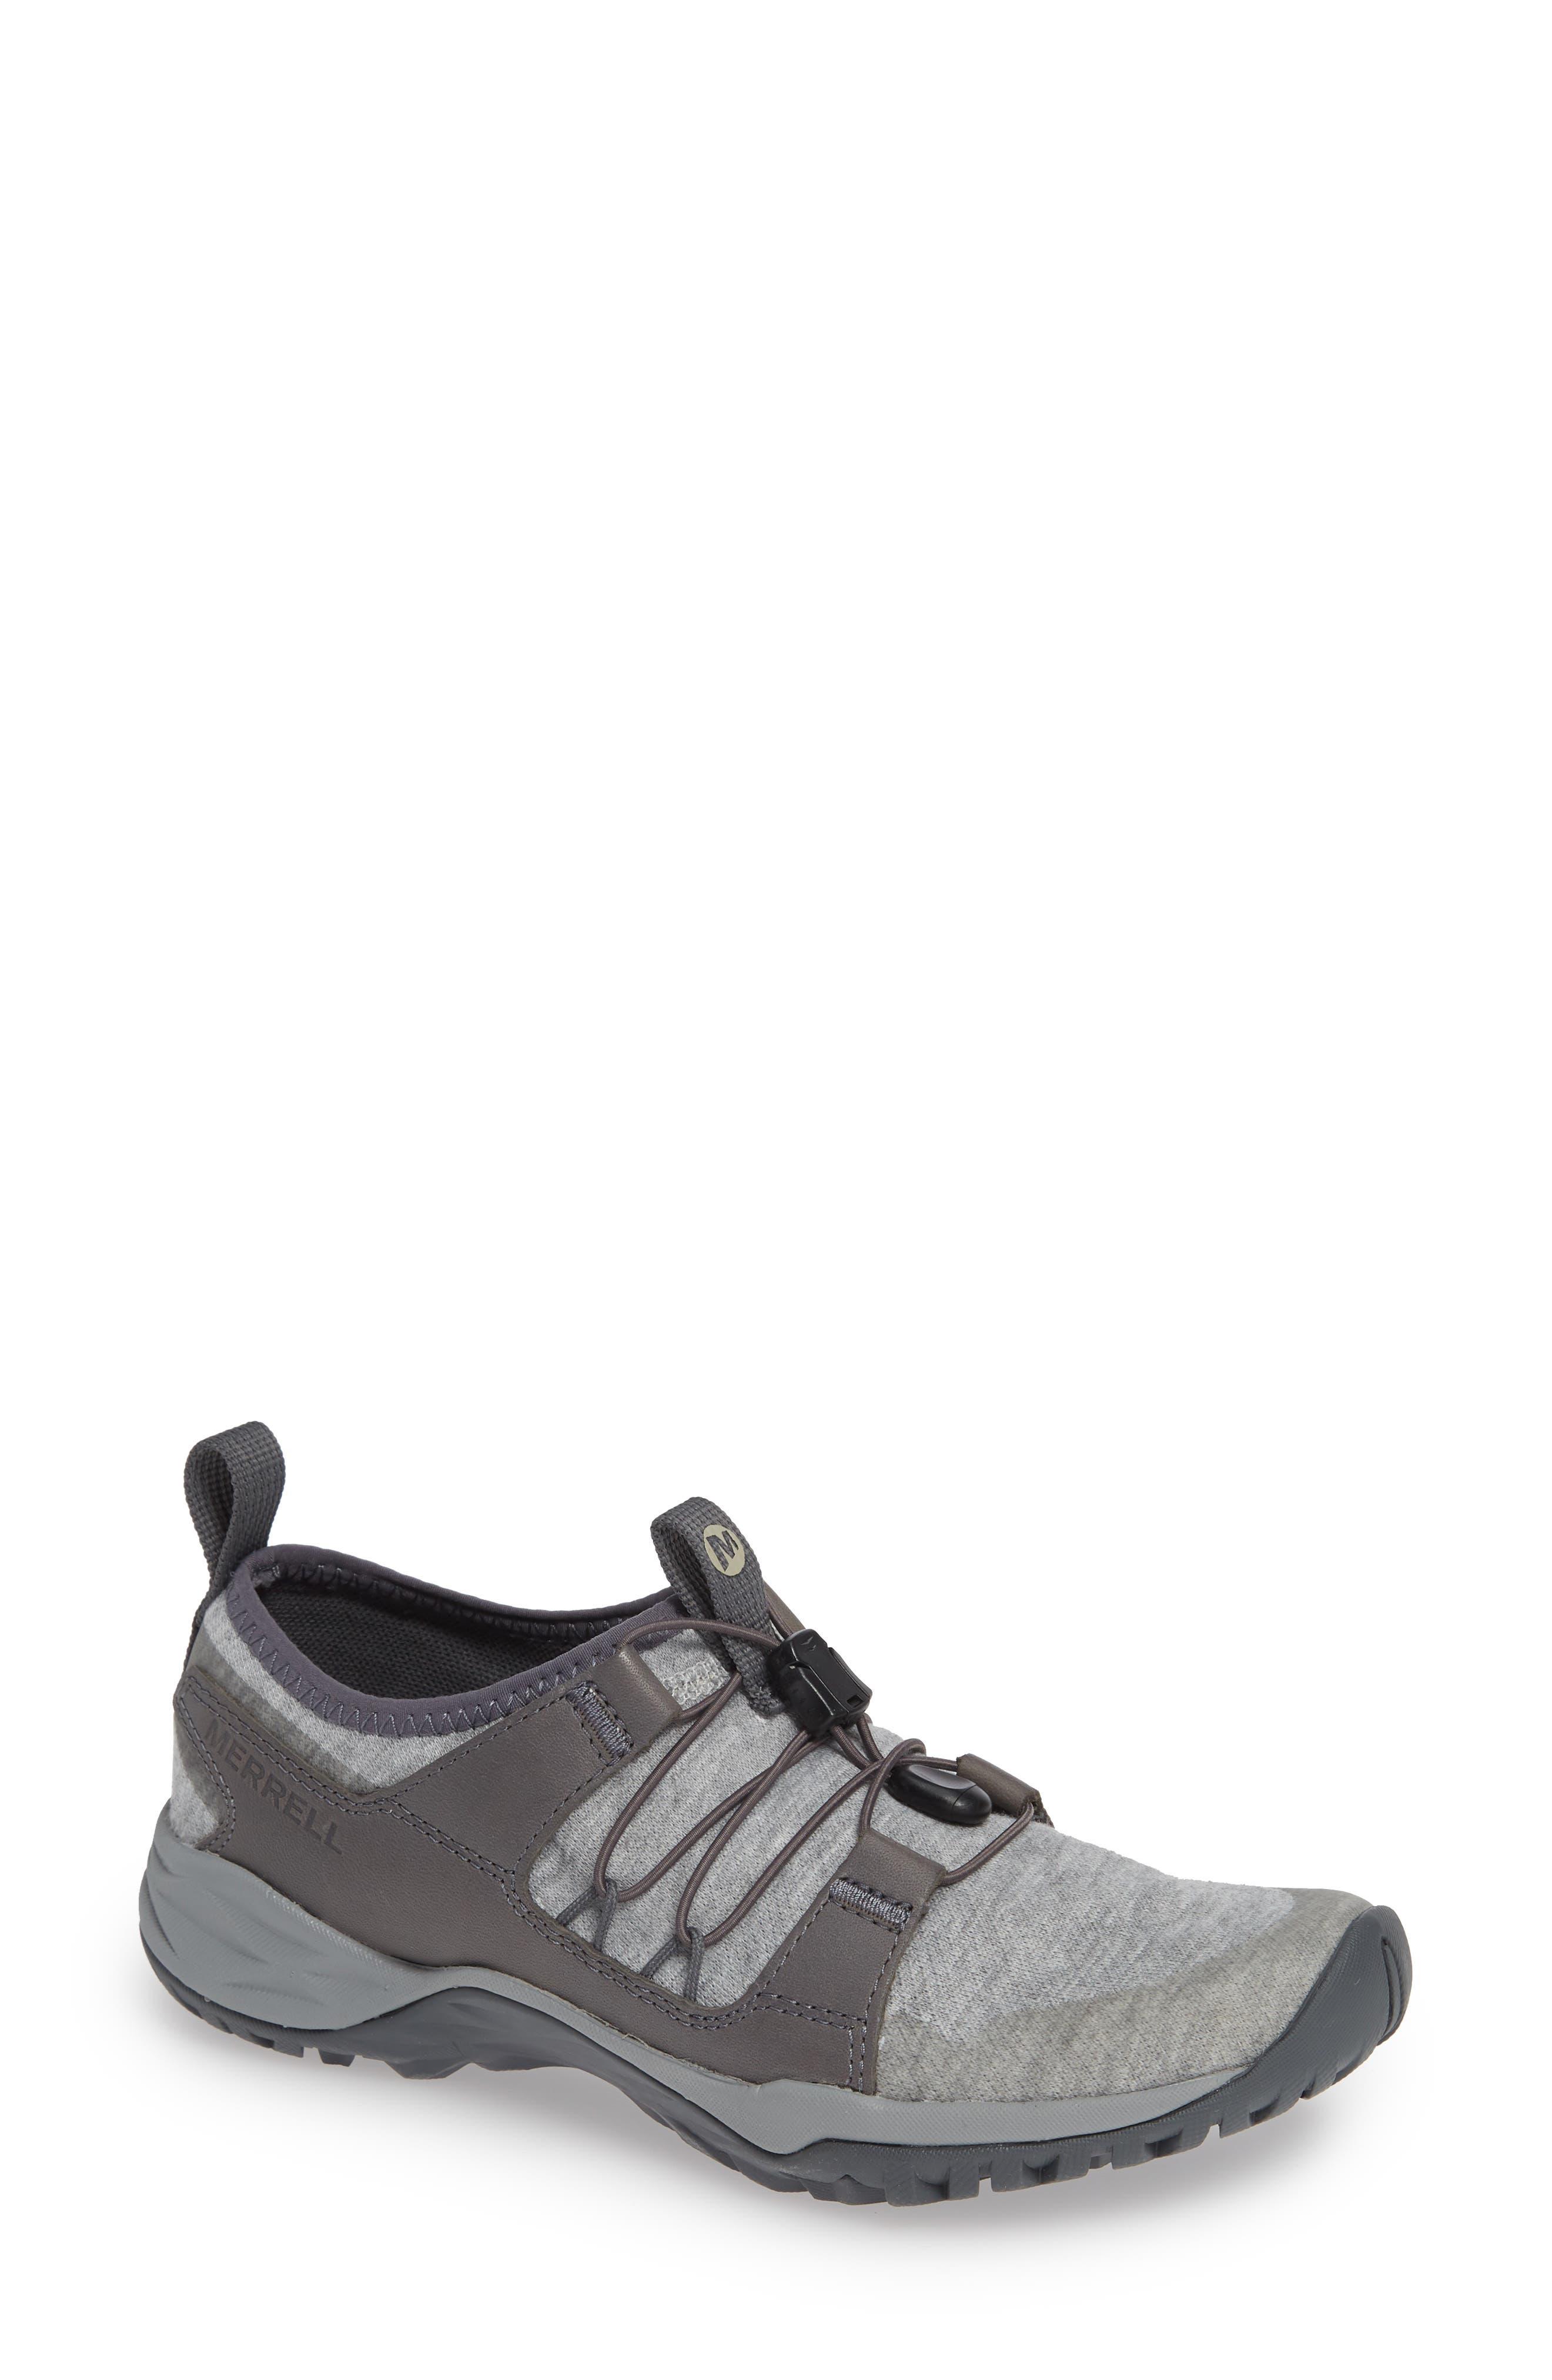 MERRELL, Siren Guided Knit Q2 Sneaker, Main thumbnail 1, color, 050